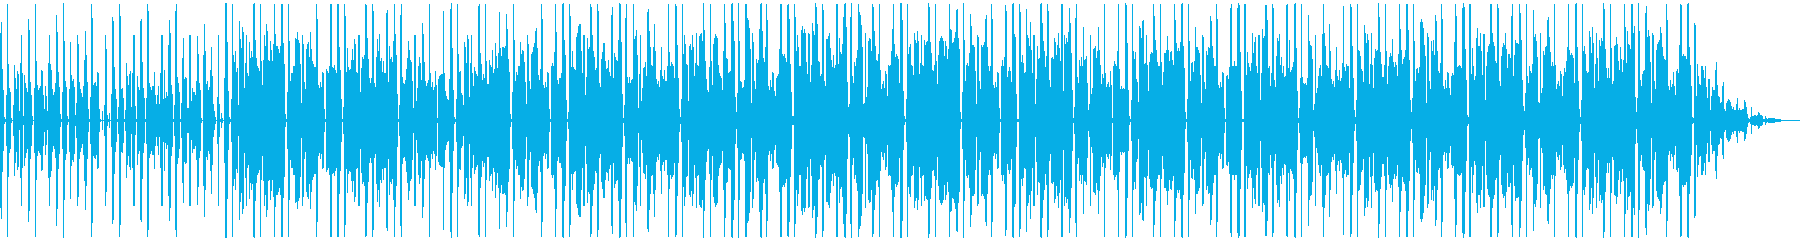 Jazzy Hip Hopの再生済みの波形